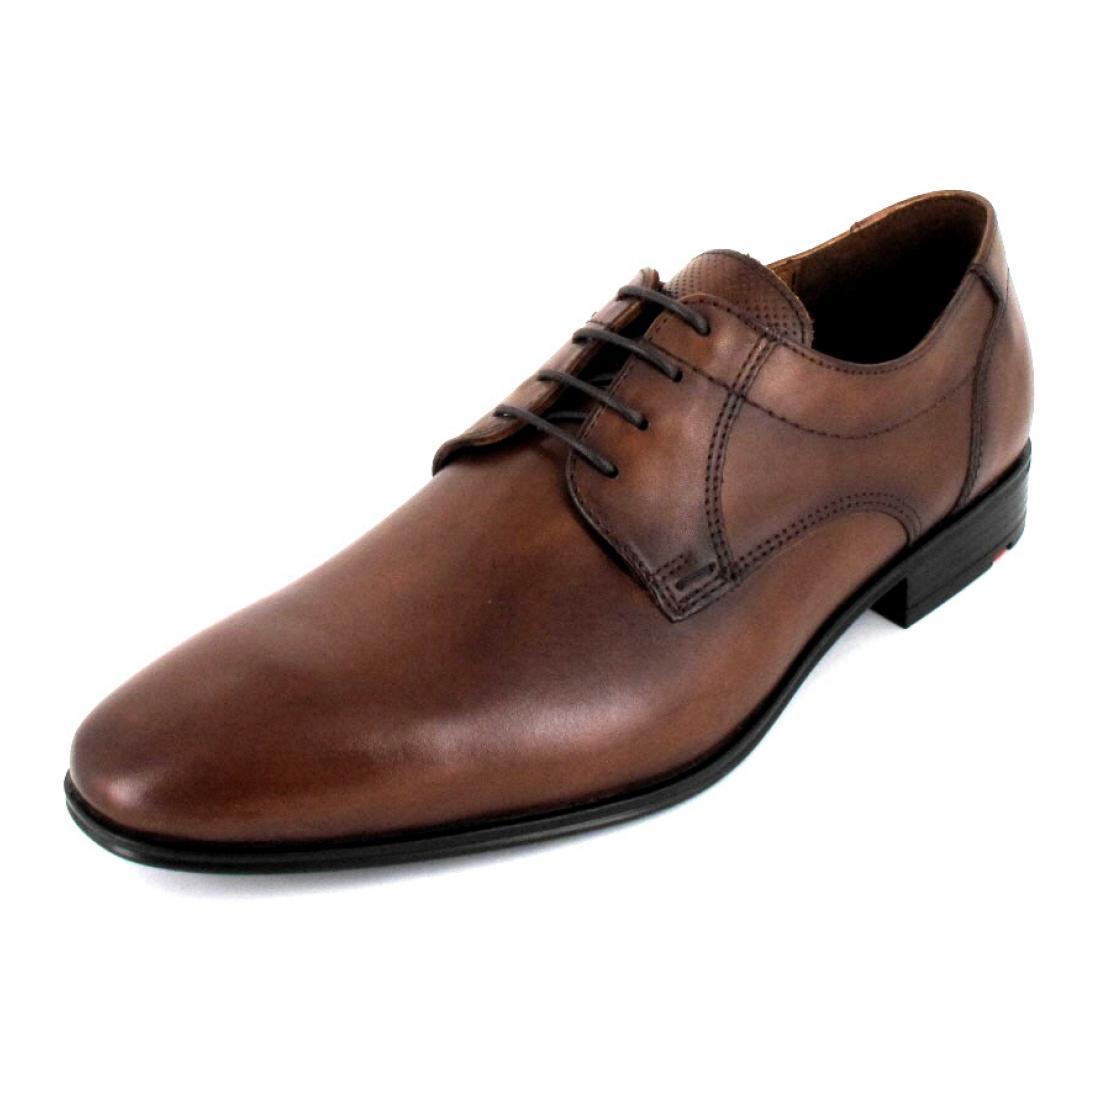 Lloyd Businesss Schuh Osmond